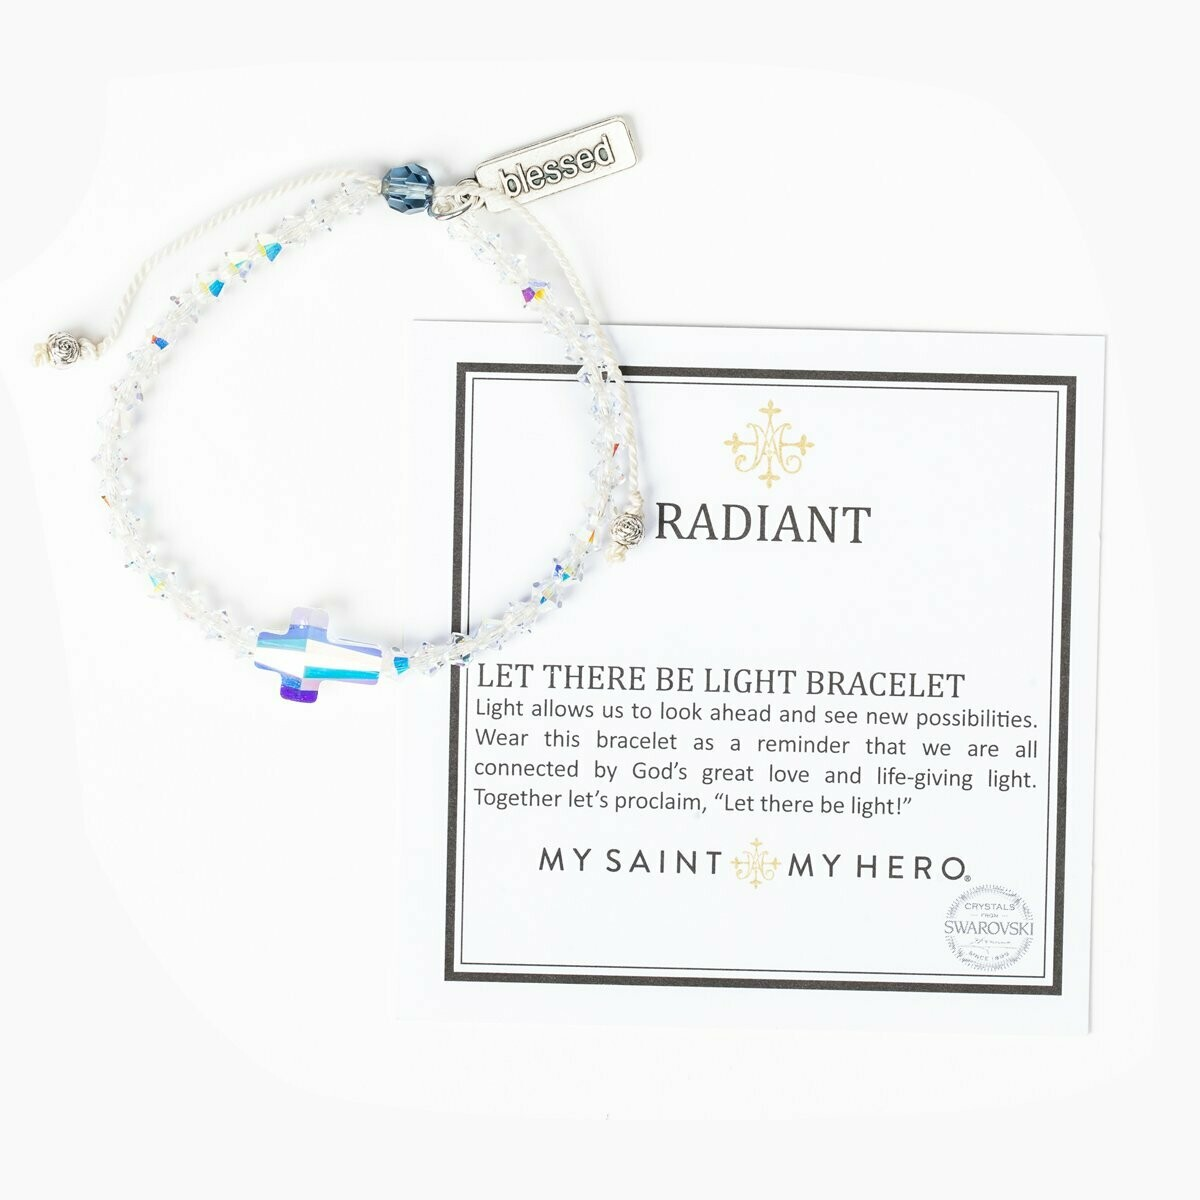 MSMH Radiant Let There Be Light Bracelet (Aurora Borealis)